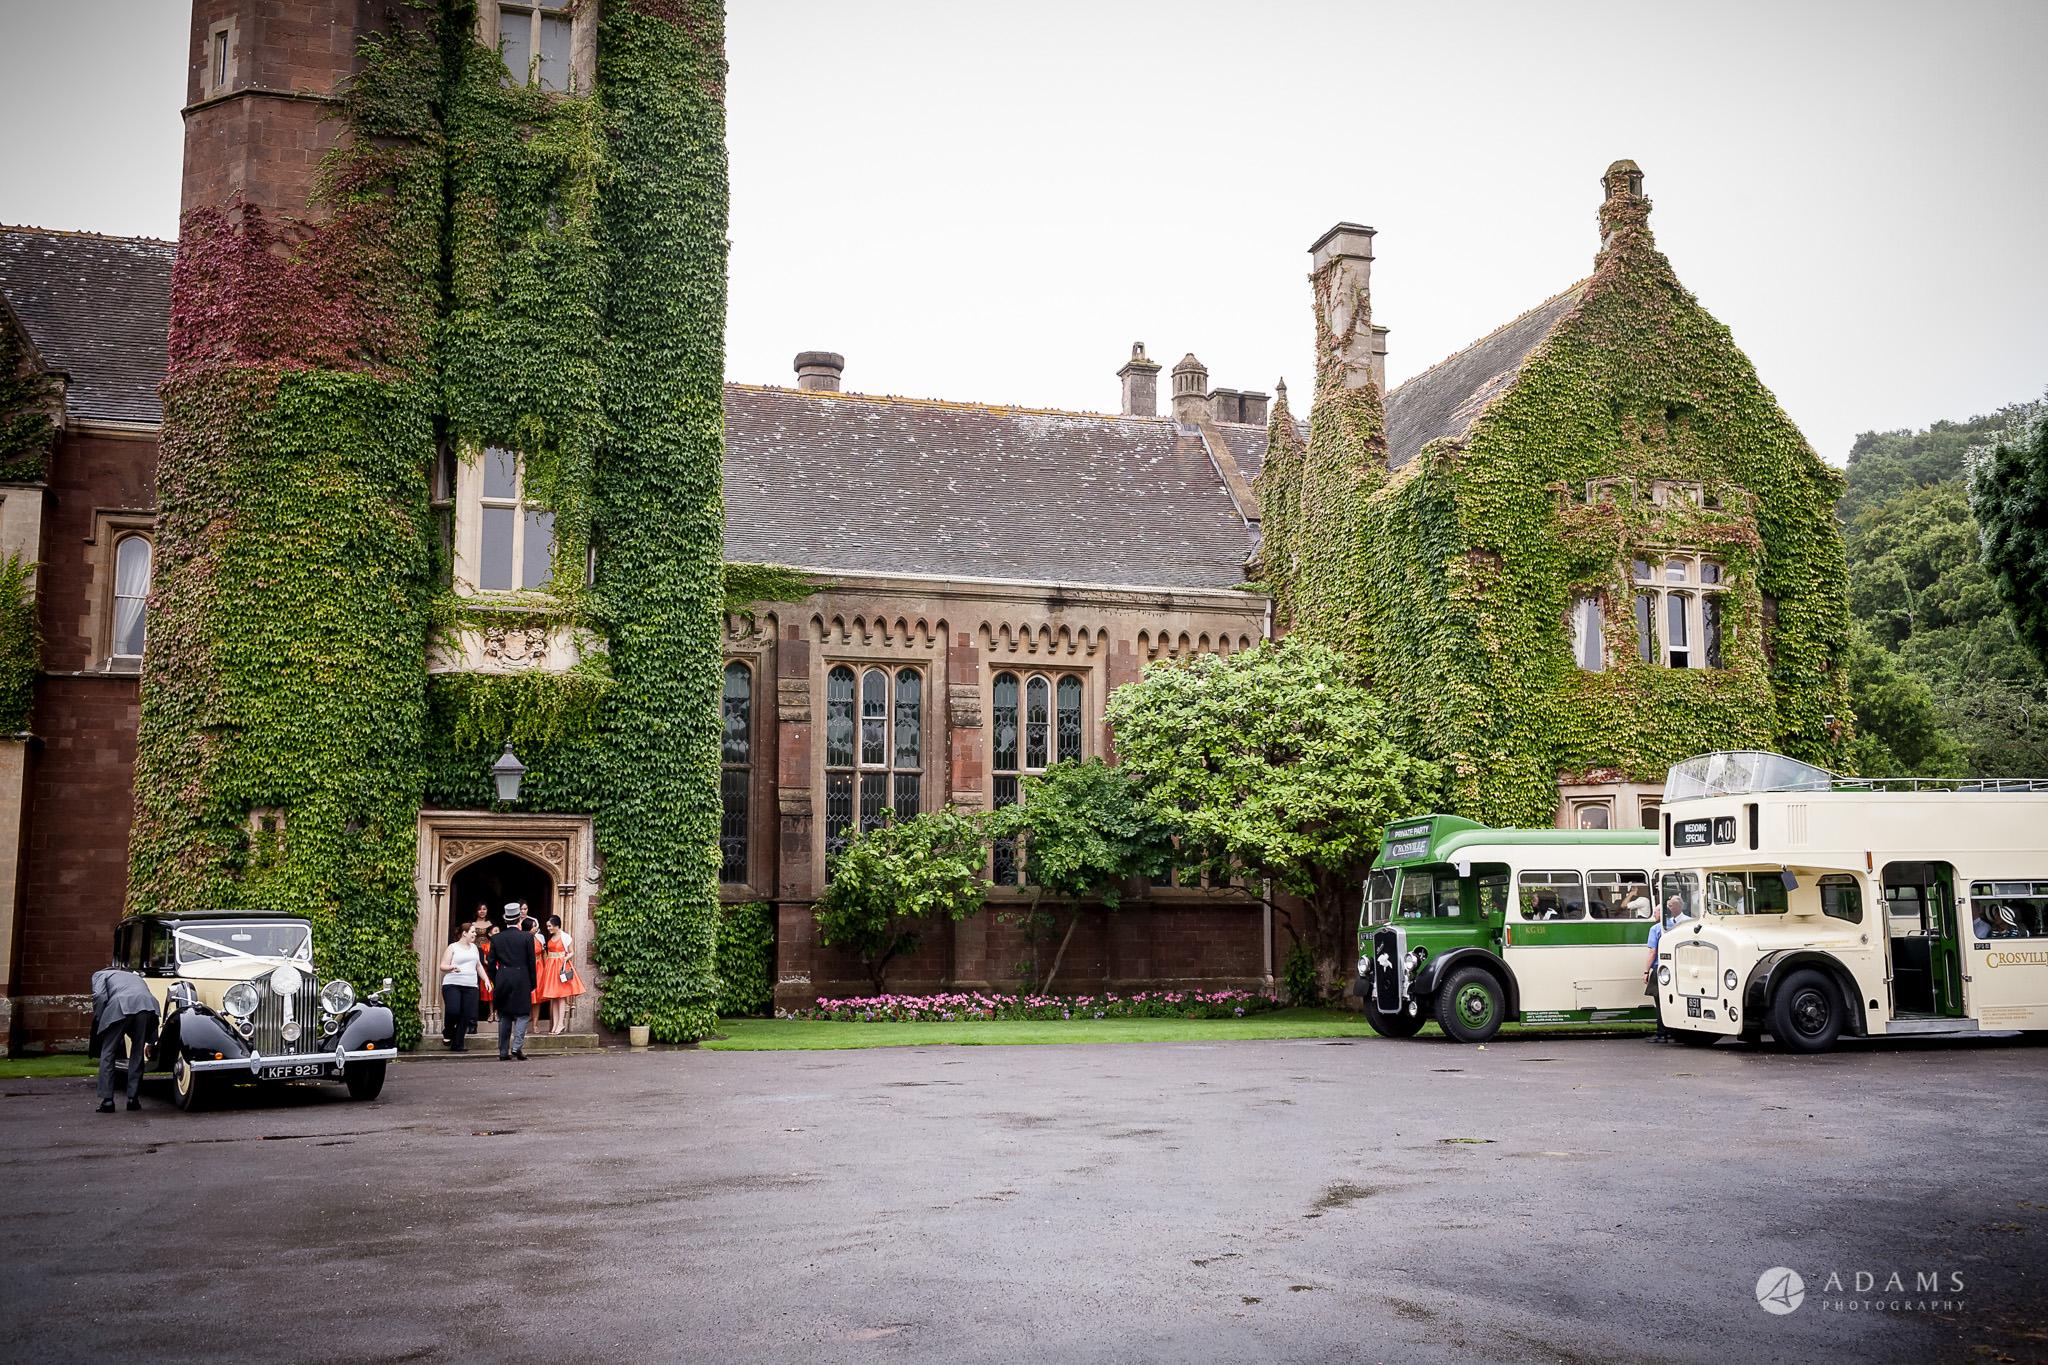 St Audries Park wedding venue busses waiting outside